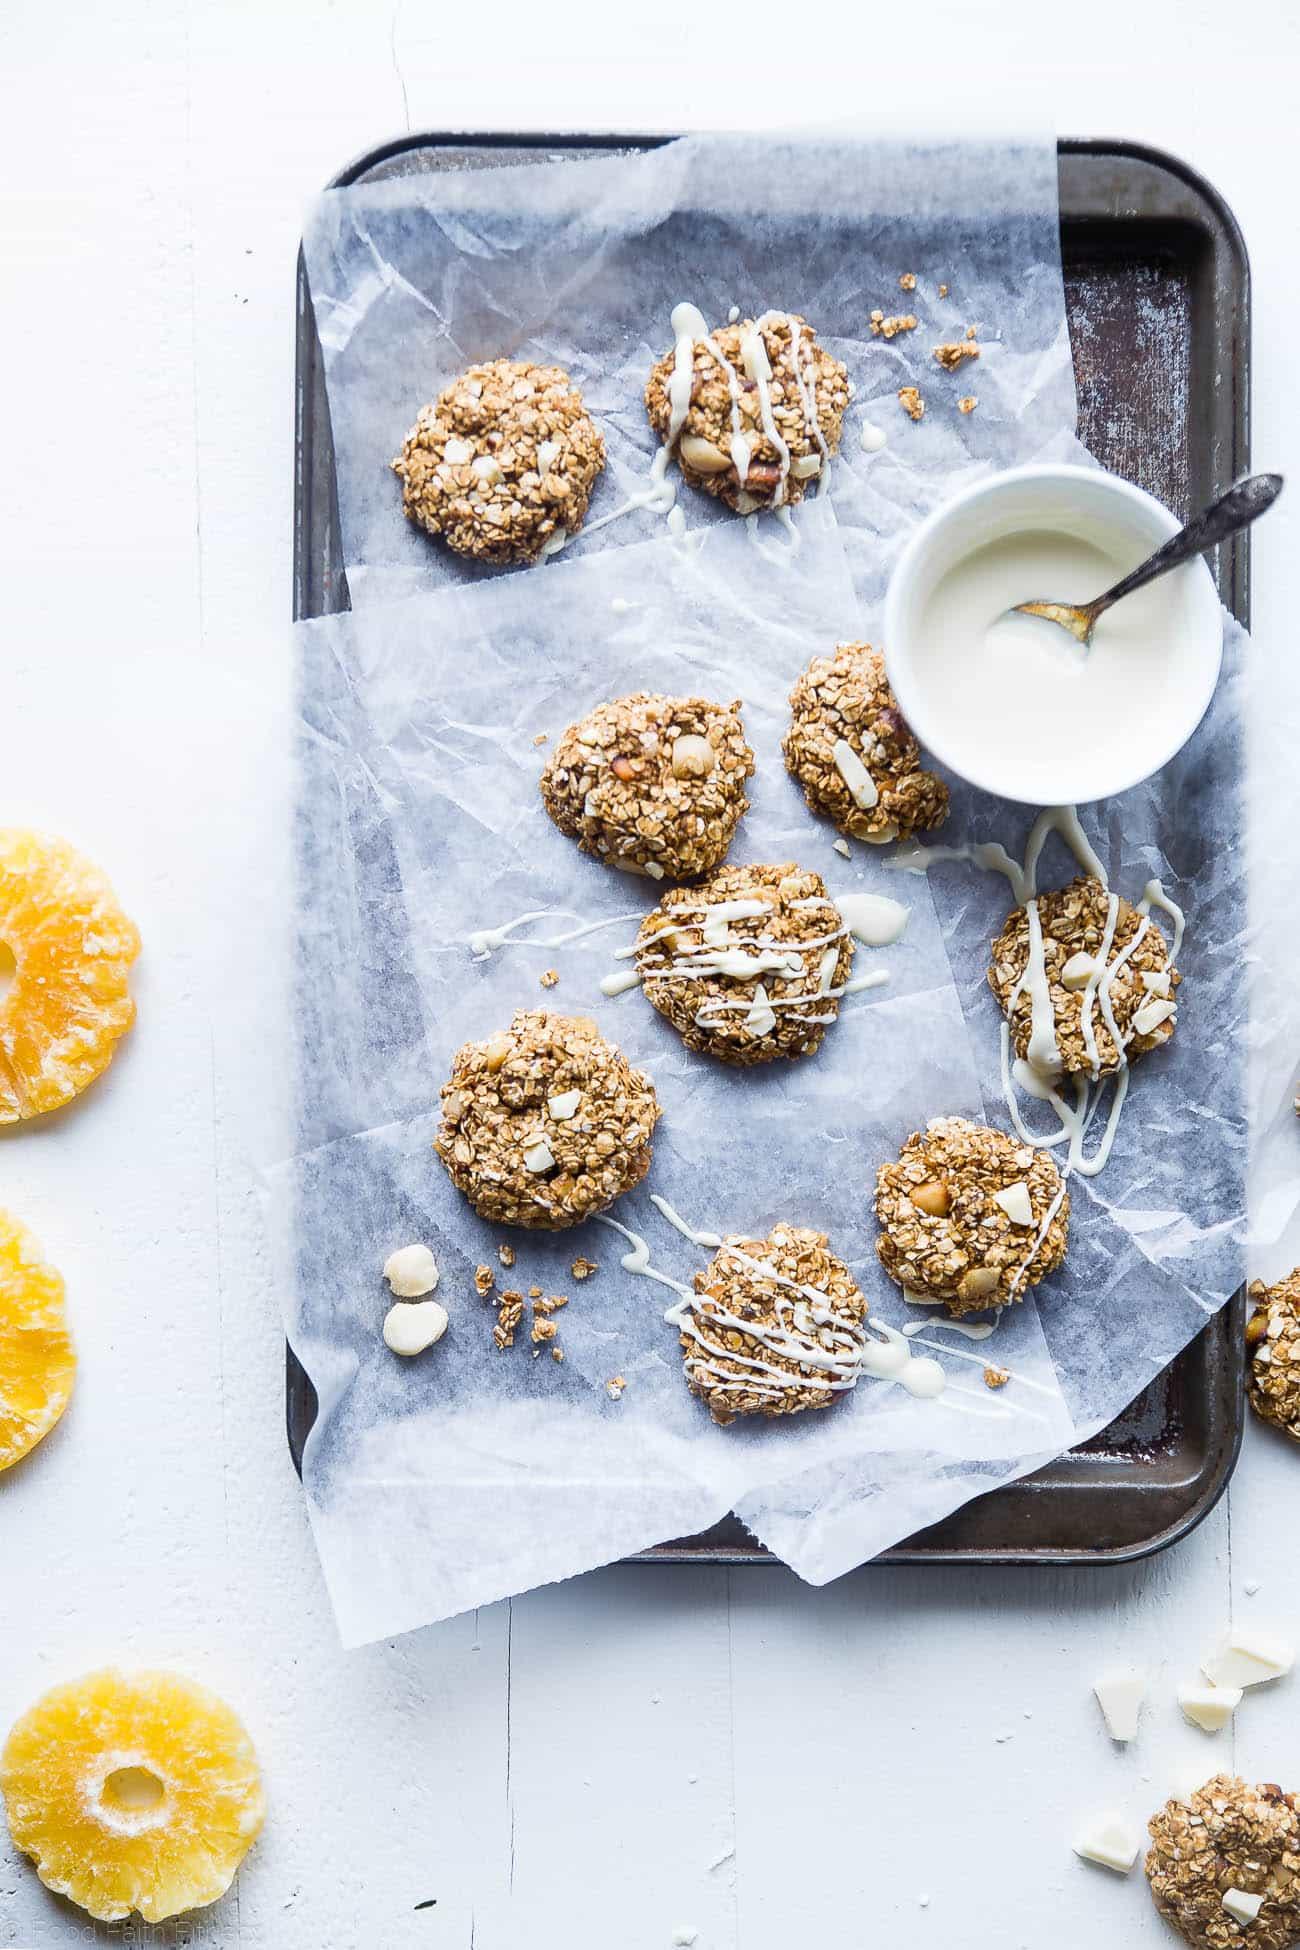 Aerial view of No bake white chocolate macadamia nut cookies on a cookie sheet. Recipe on Foodfaithfitness.com